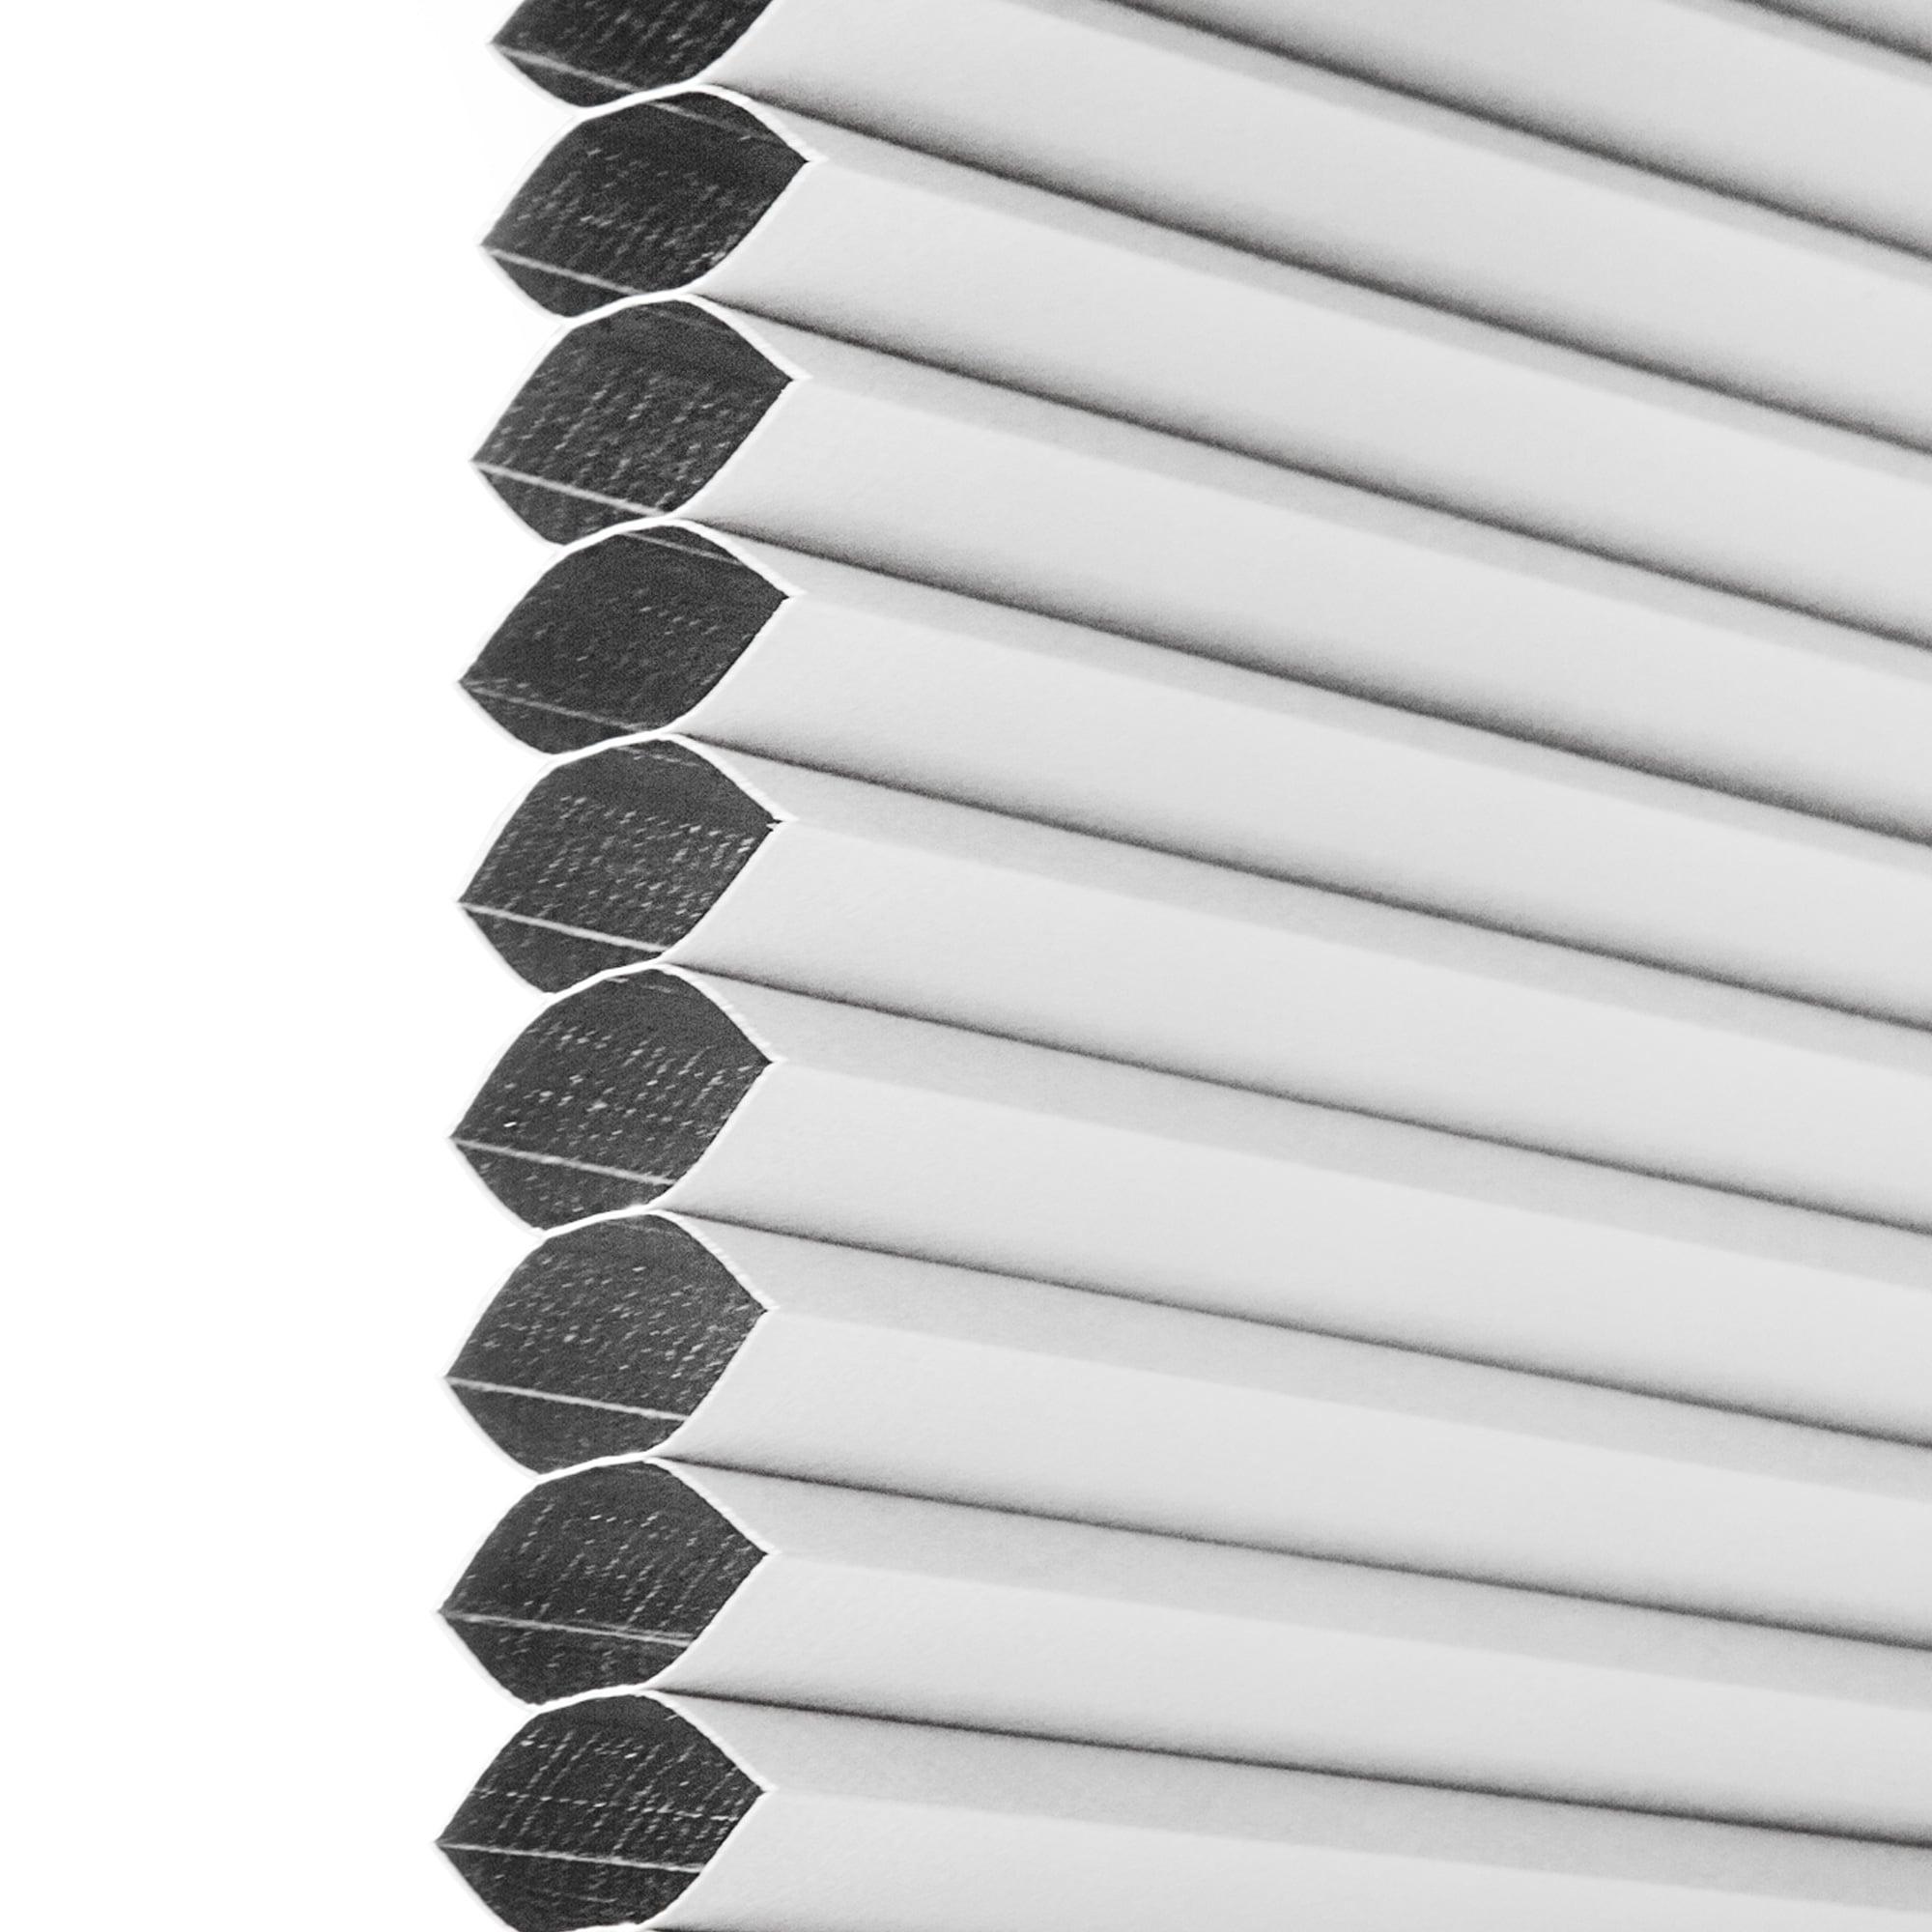 plissee wabenplissee thermoschutz blickdicht top qualit t faltrollo plisseerollo ebay. Black Bedroom Furniture Sets. Home Design Ideas